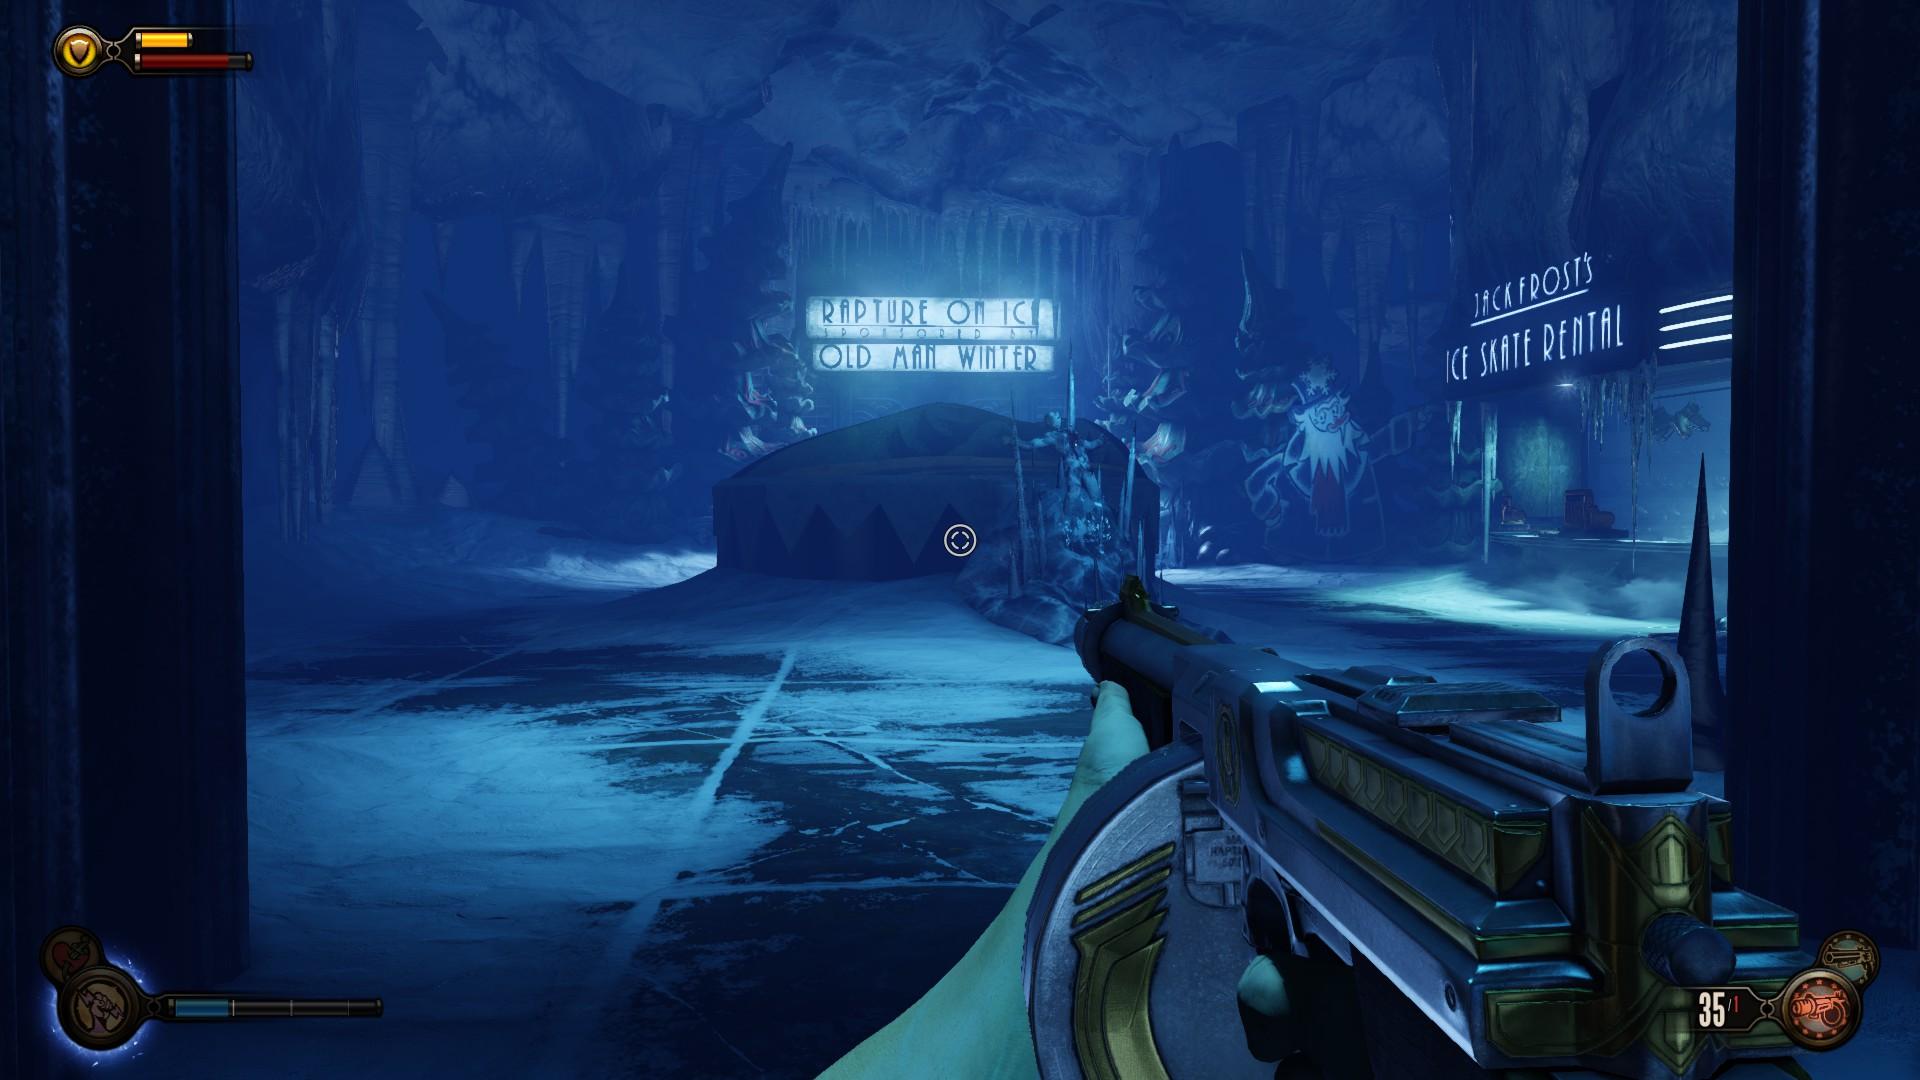 BioShock Infinite: Burial at Sea delivers (en)Rapture and ...